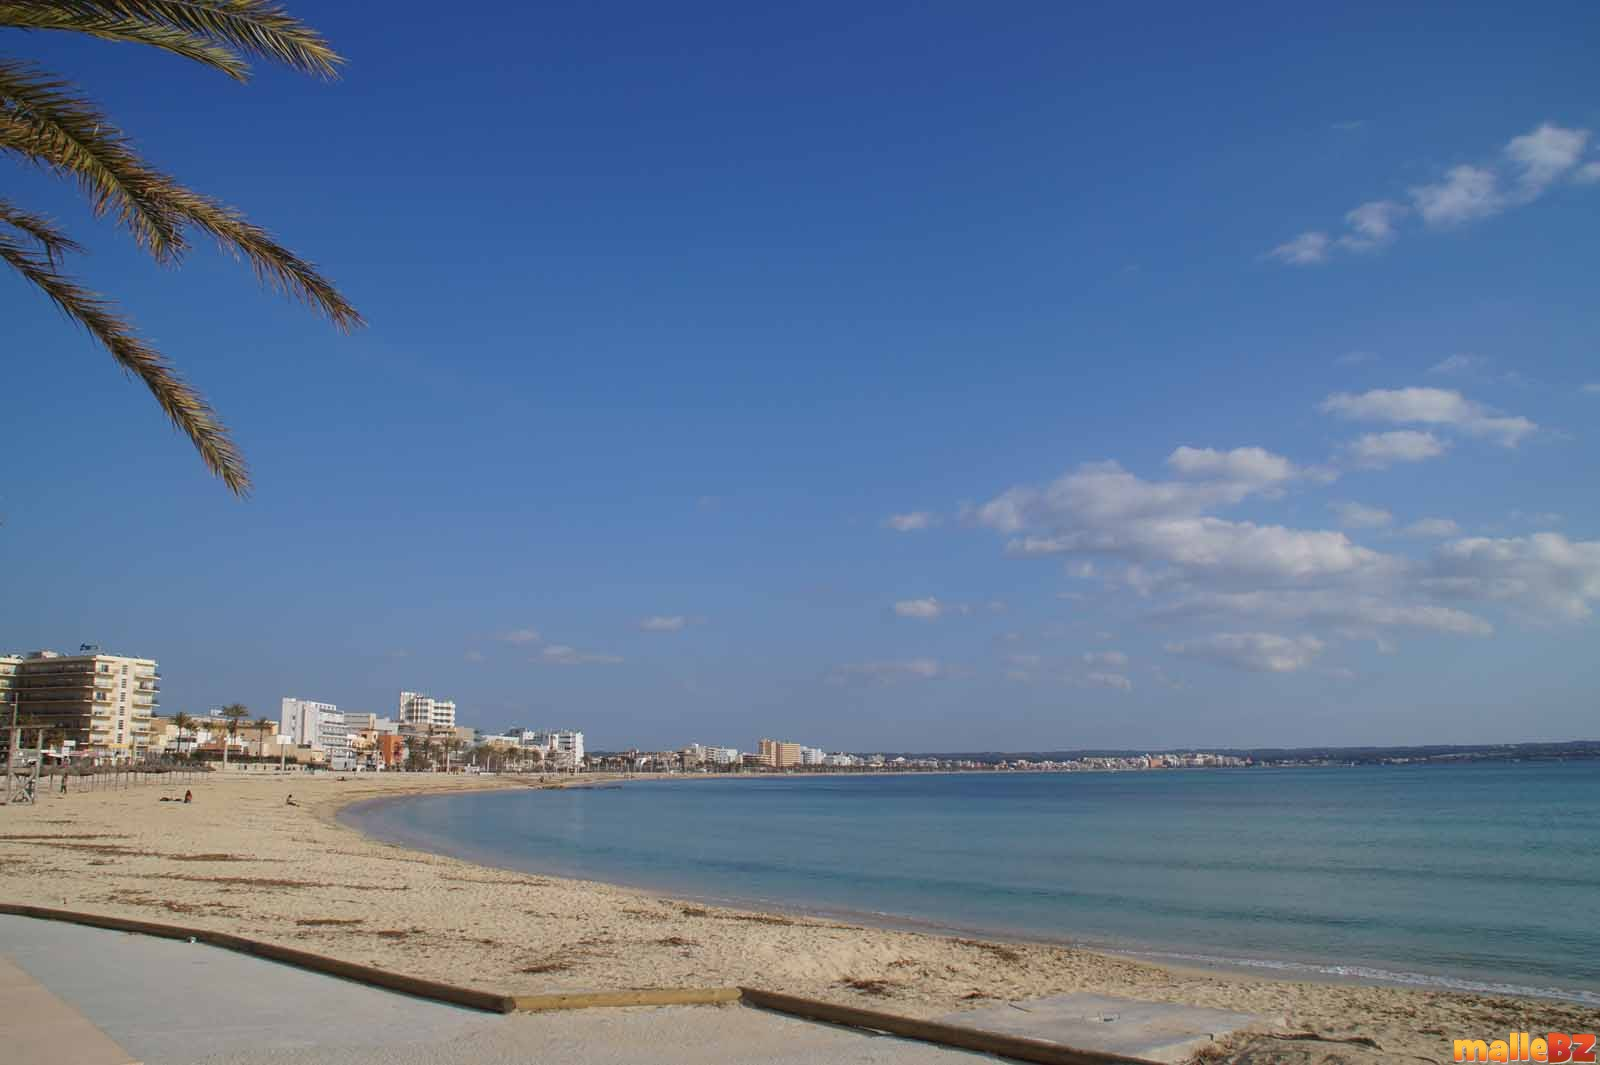 Playa De Palma Webcam